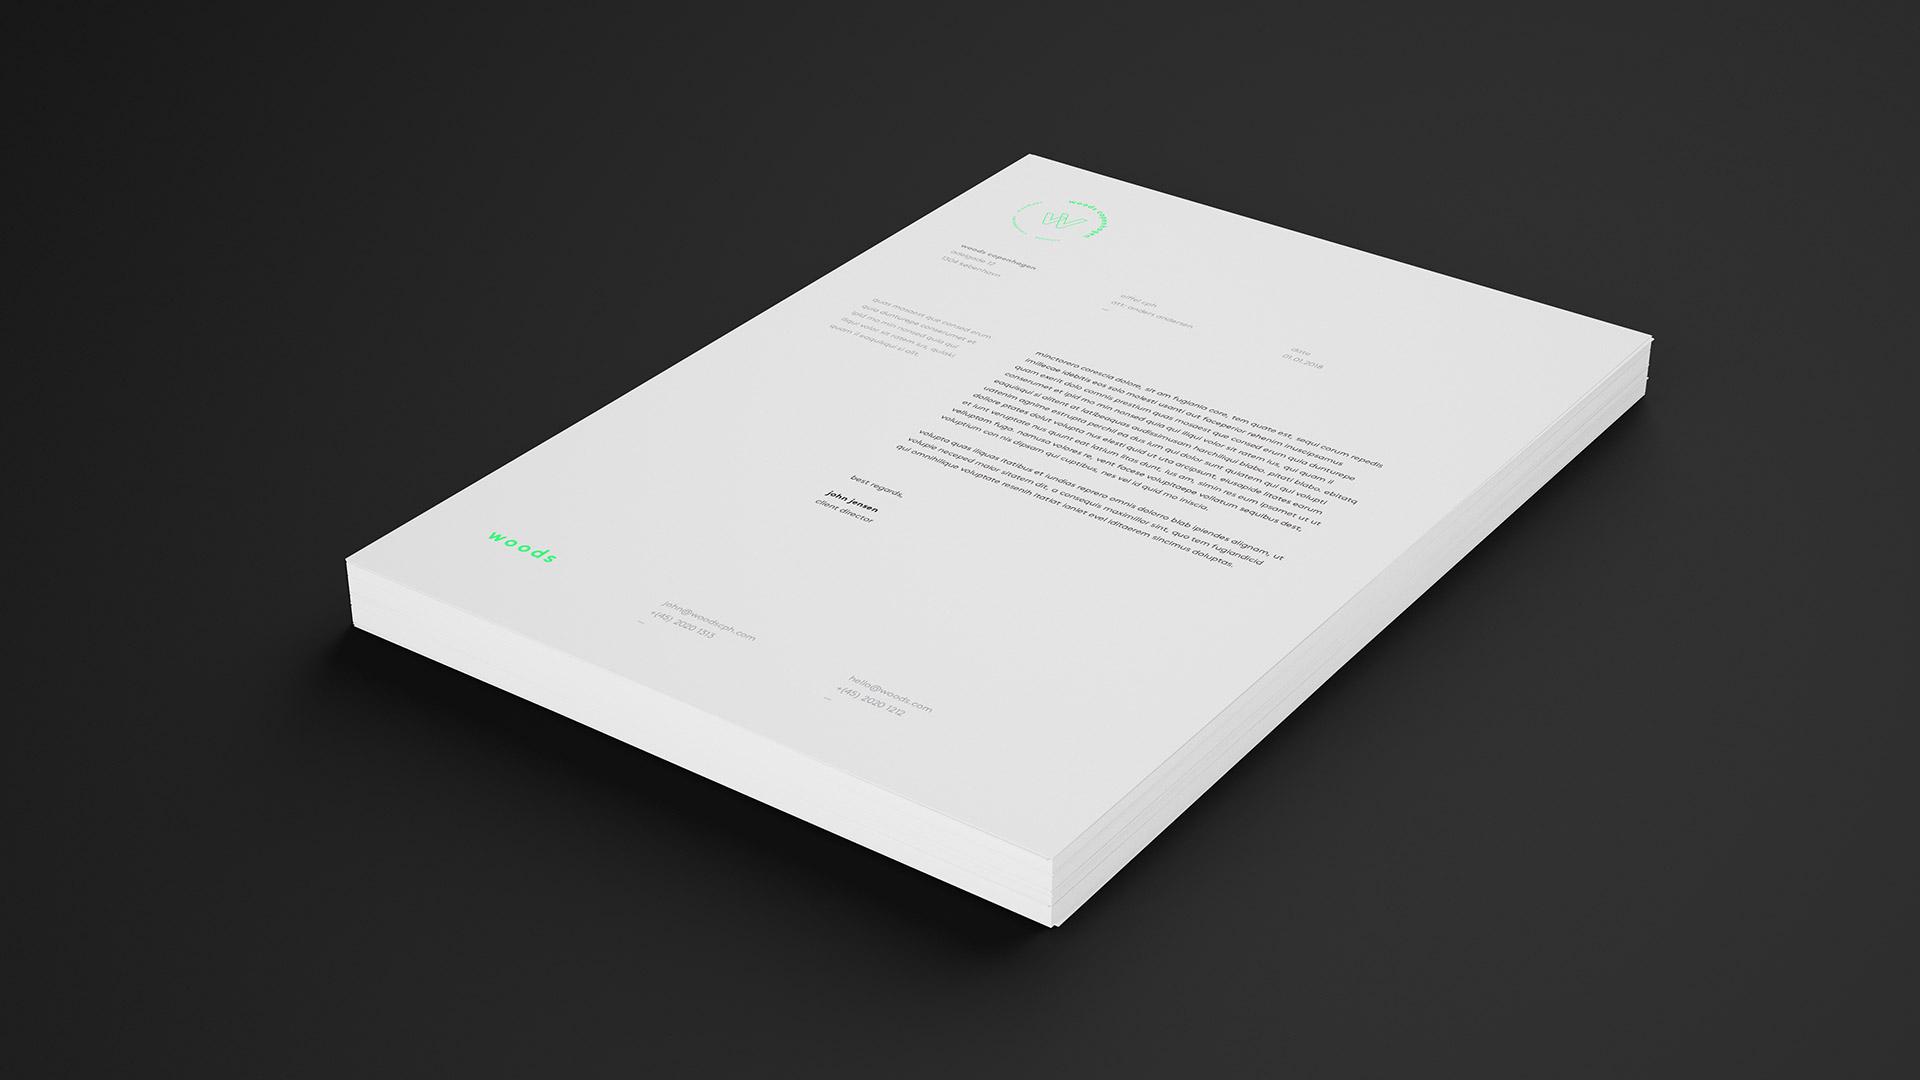 Tetris - Woods - Visuel identitet - Brevpapir